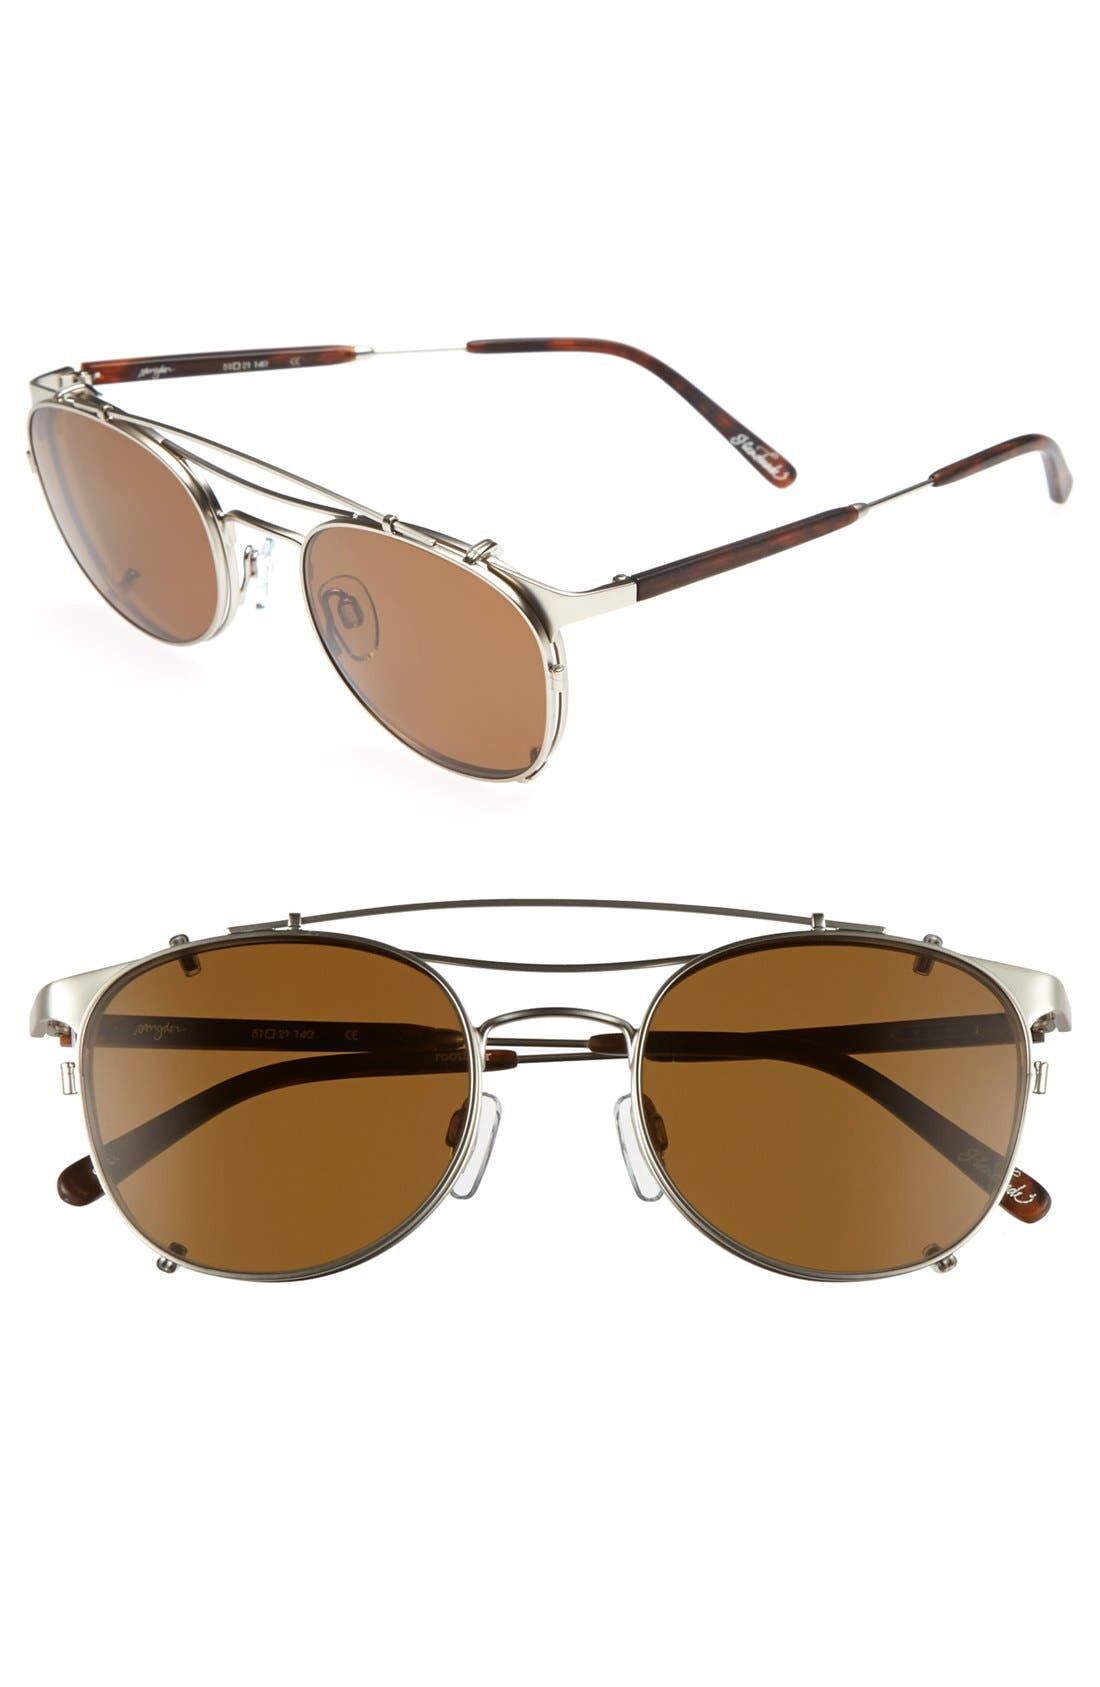 Main Image - RAEN 'Stryder' 51mm Sunglasses